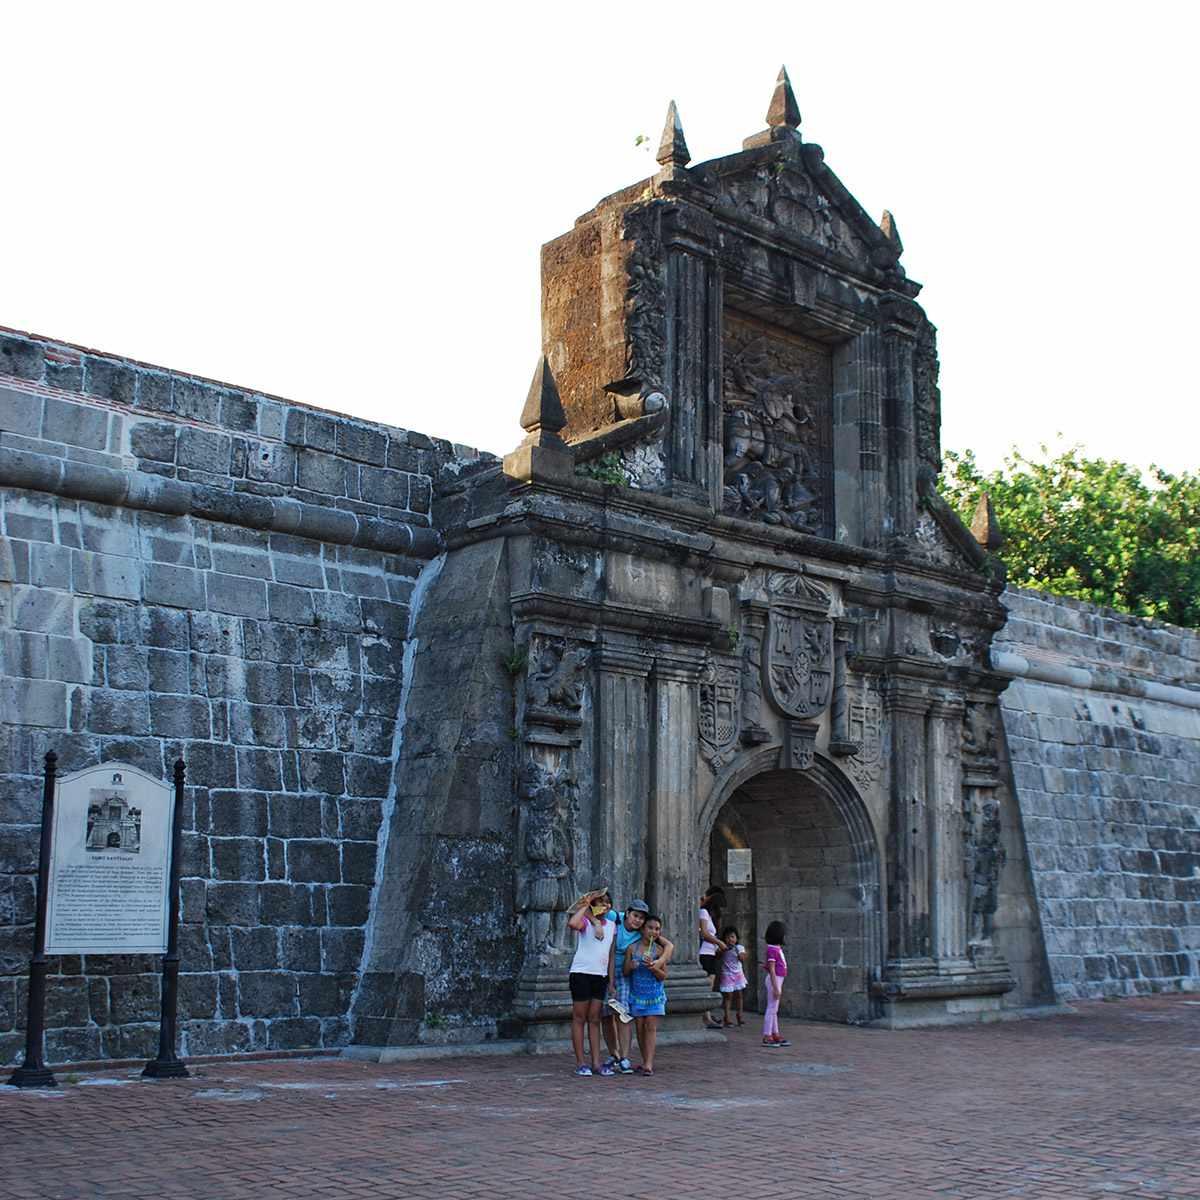 The gate of Fort Santiago, Intramuros, Manila